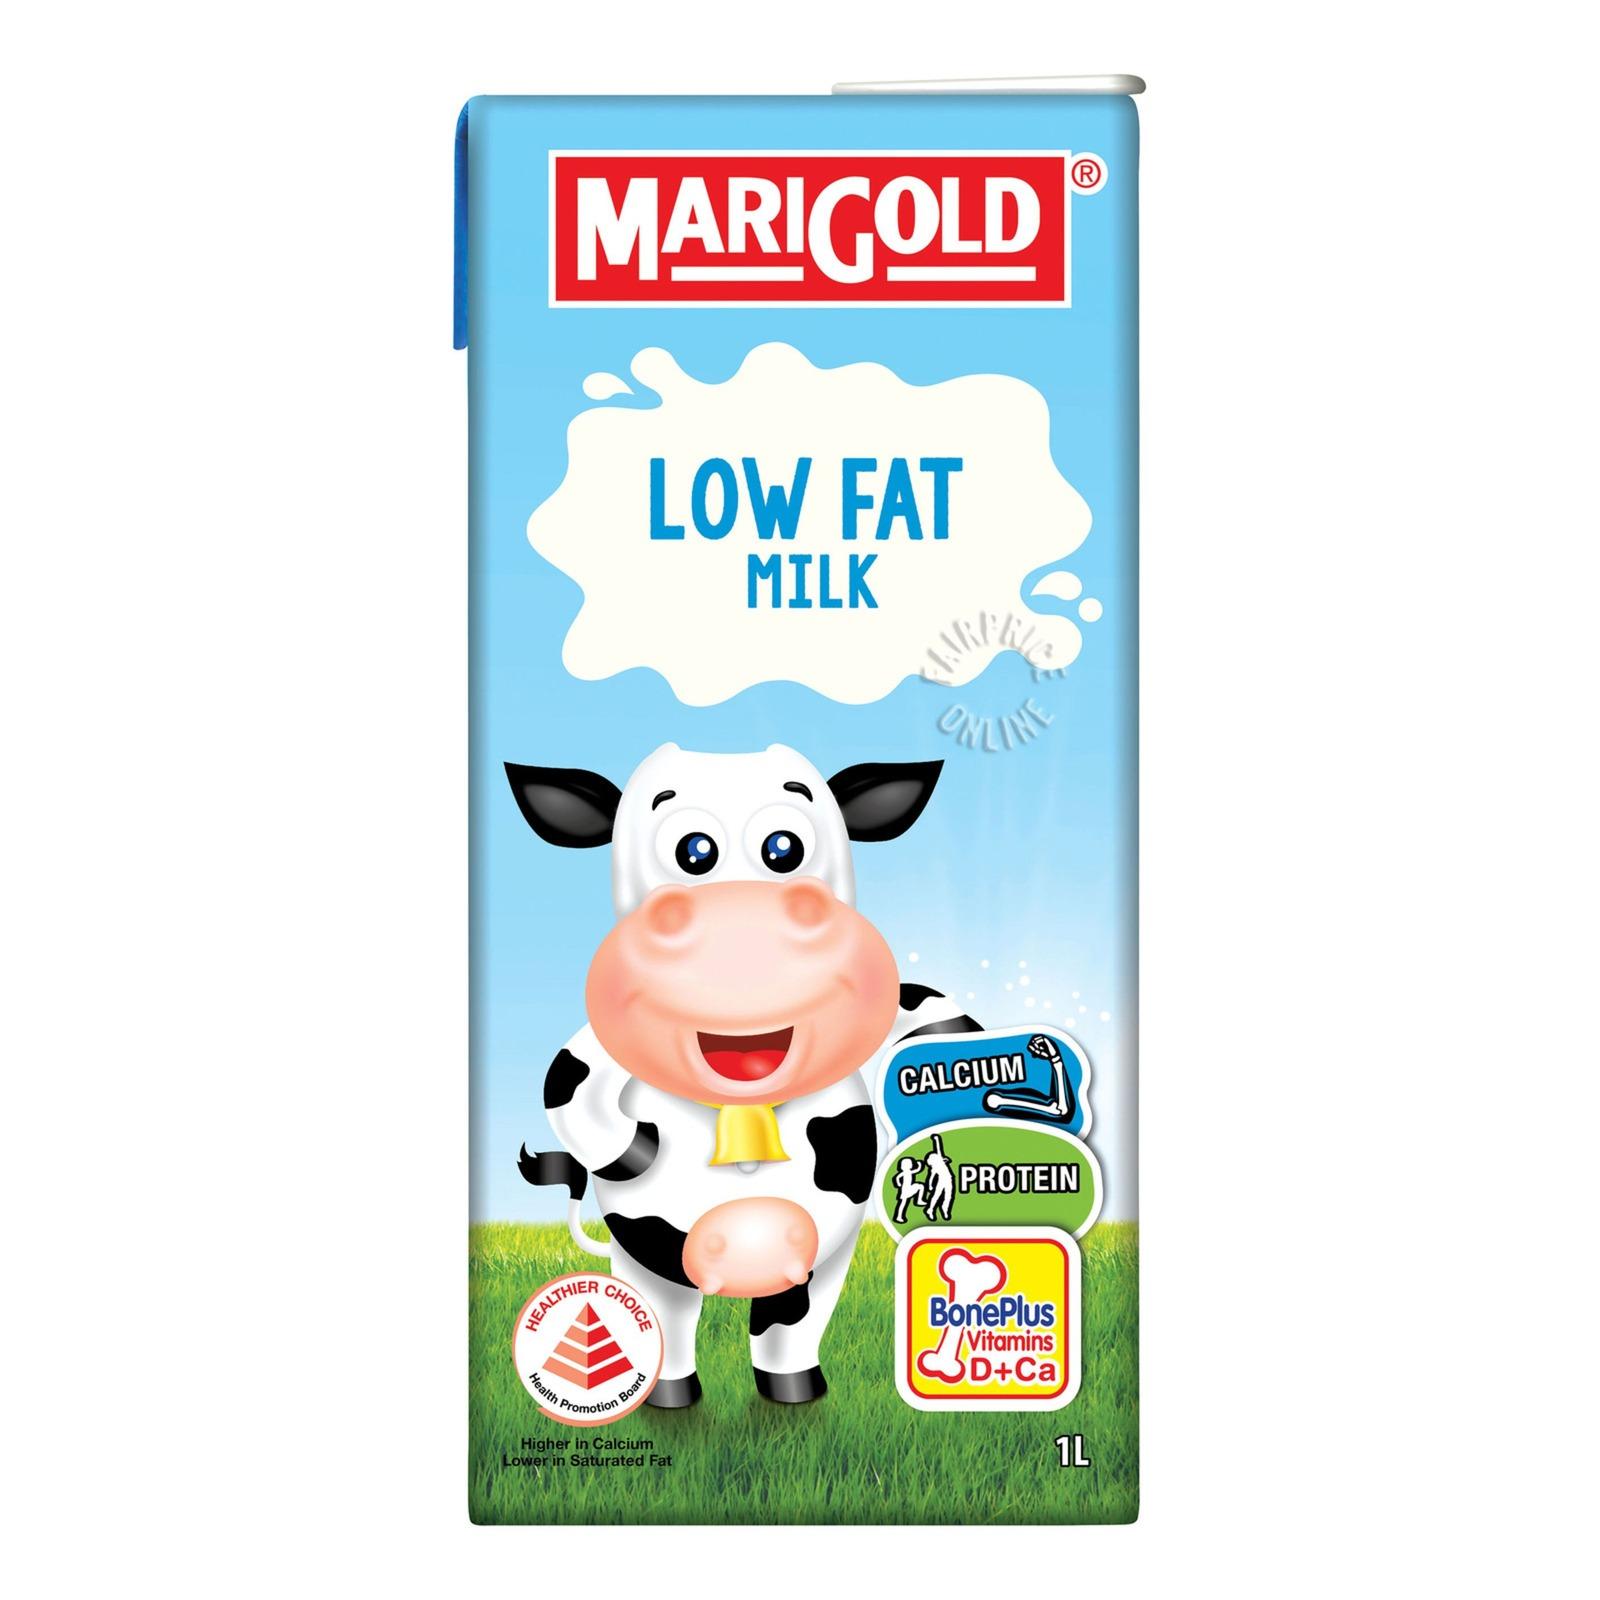 Marigold UHT Packet Milk - Low Fat